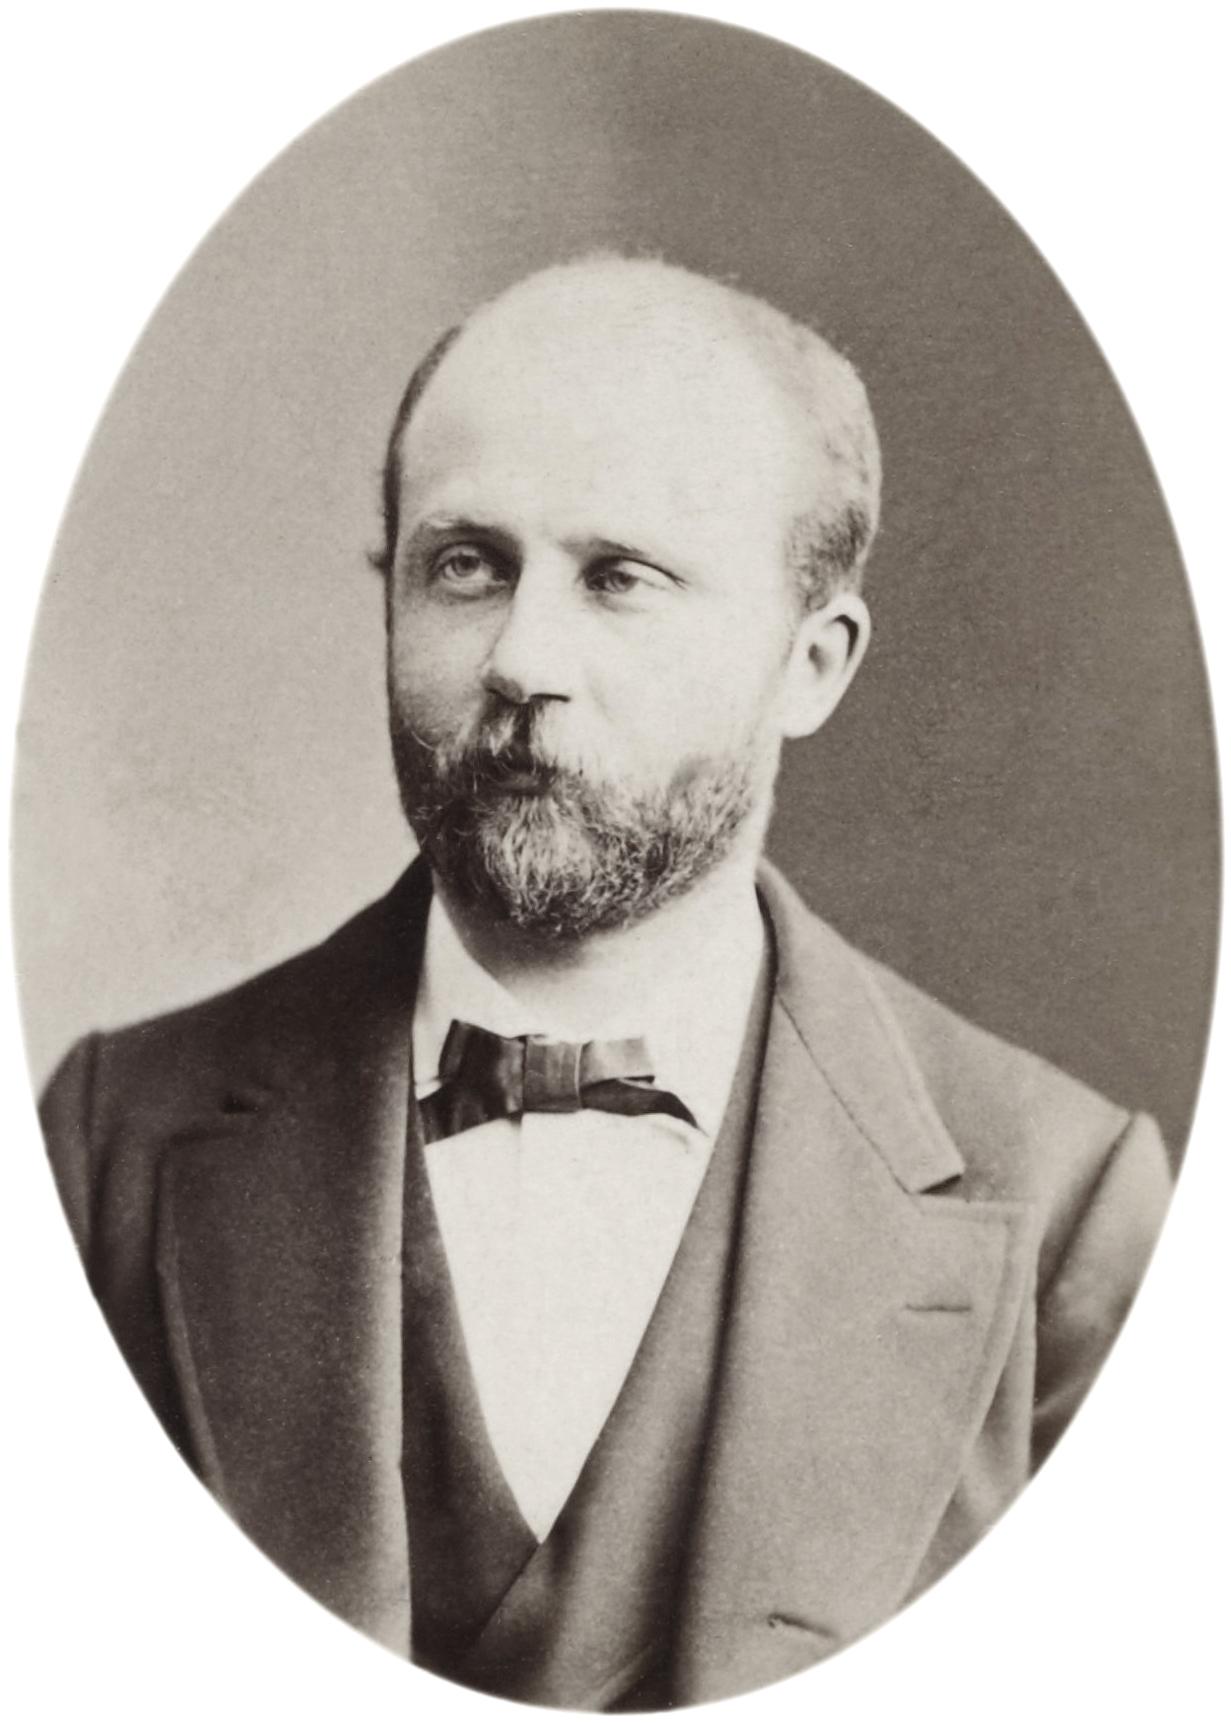 L'archeologo Gaston Maspero